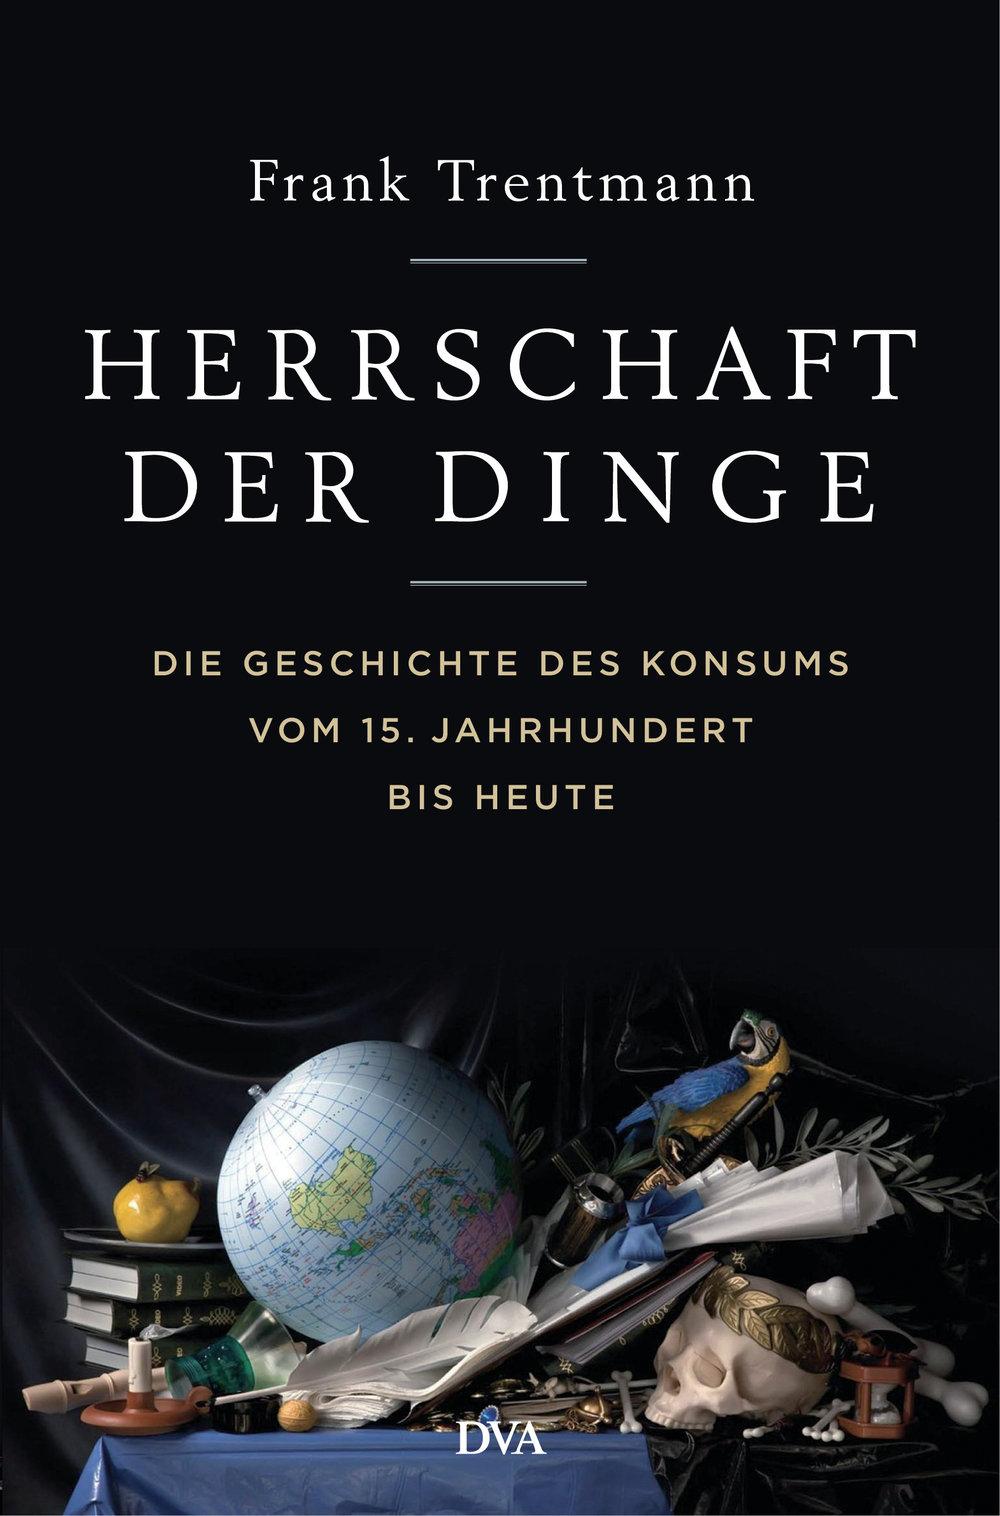 Trentmann_FHerrschaft_der_Dinge_v6_172705.jpg